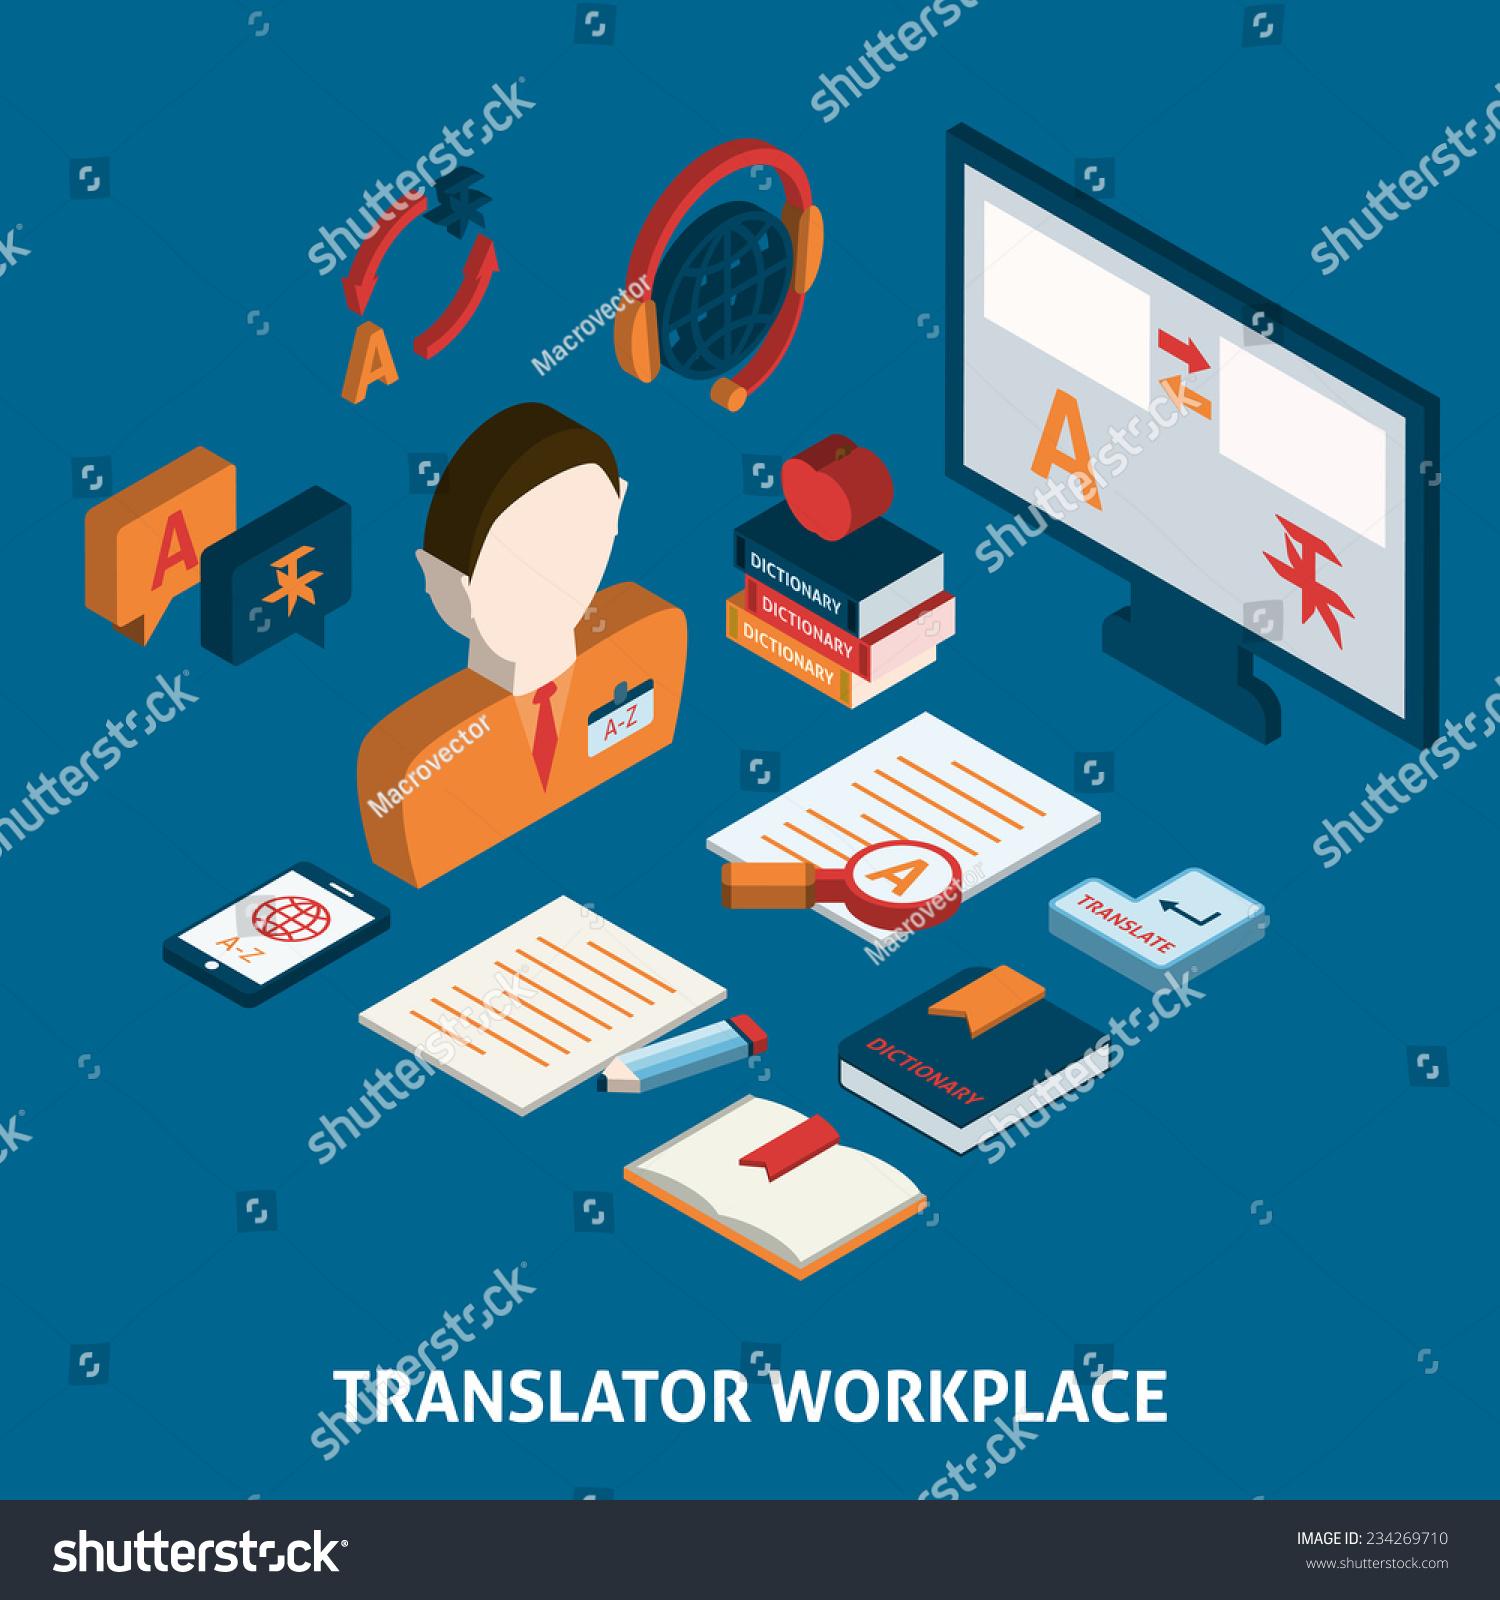 Секс онлайн офис рус переводчик фото 51-581